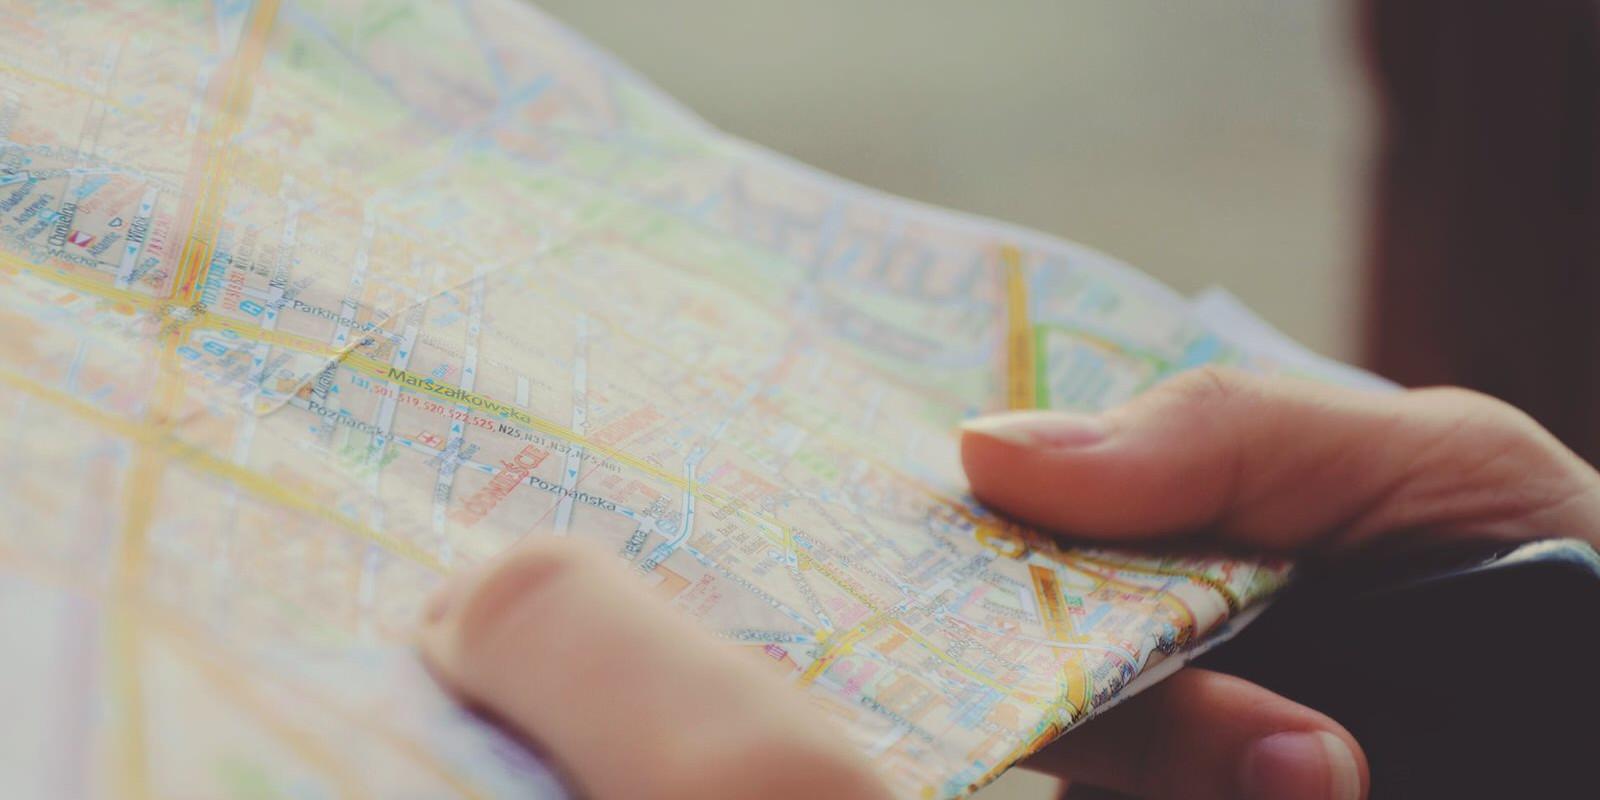 Holding map mrstvu